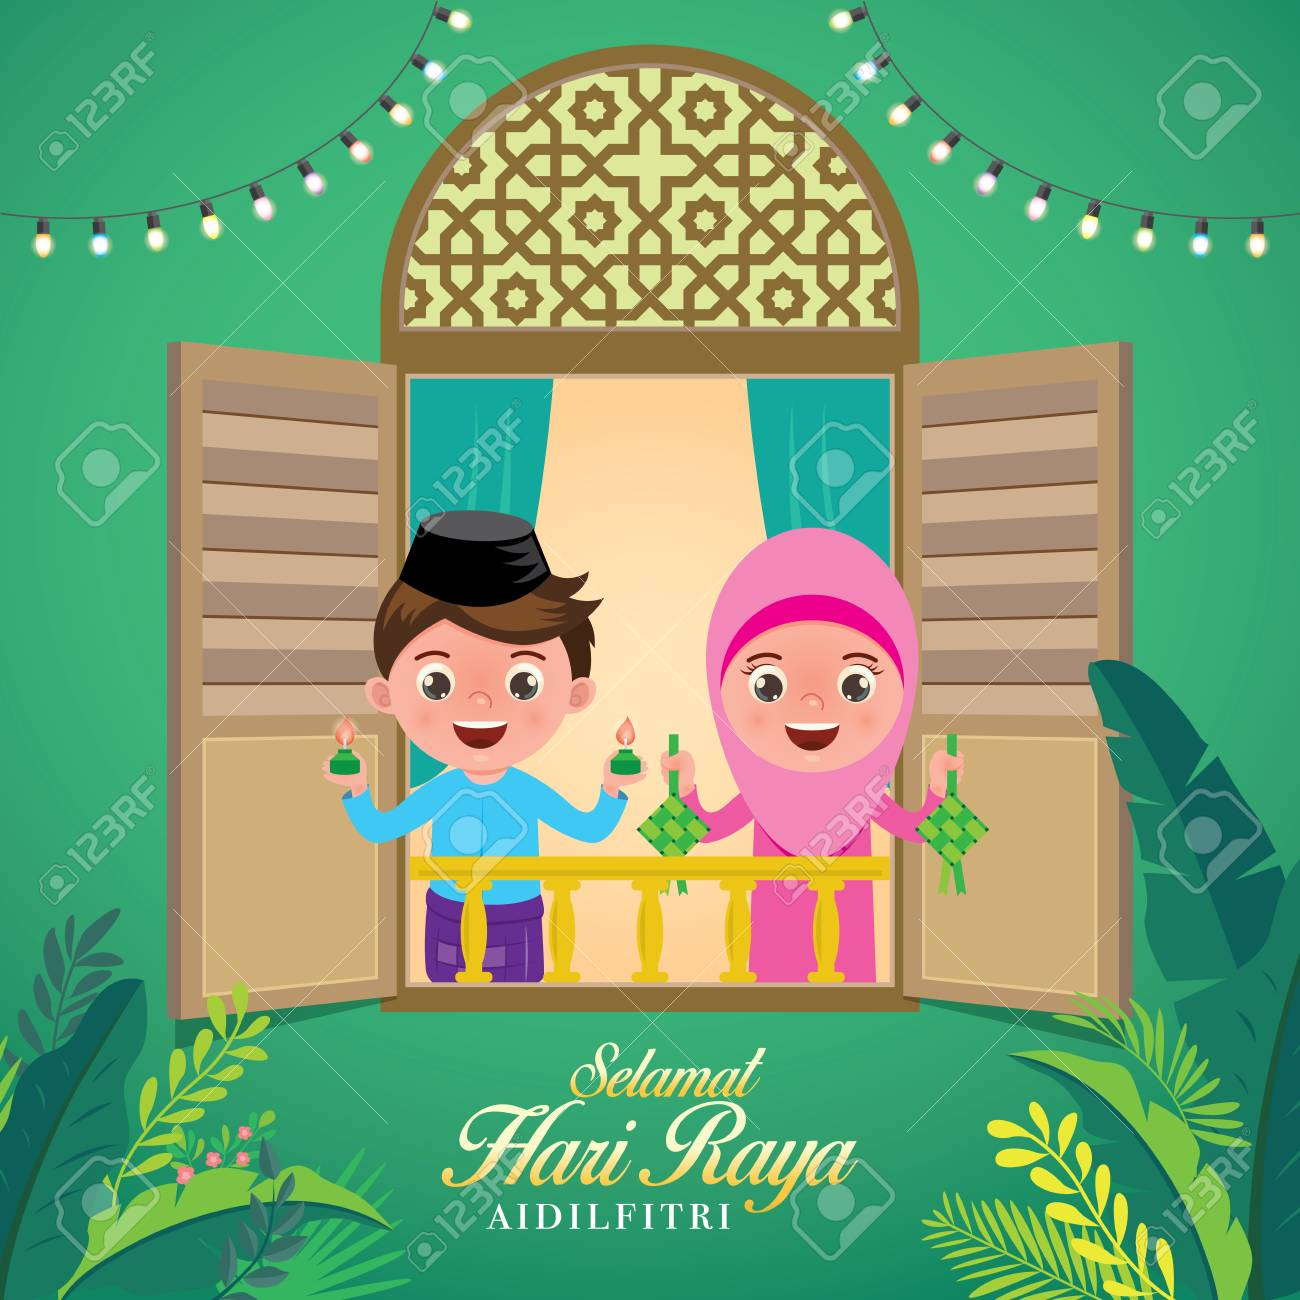 "vector illustration with cute muslim kids holding a lamp light and ketupat. Malay word ""selamat hari raya aidilfitri"" that translates to wishing you a joyous hari raya. - 121249645"